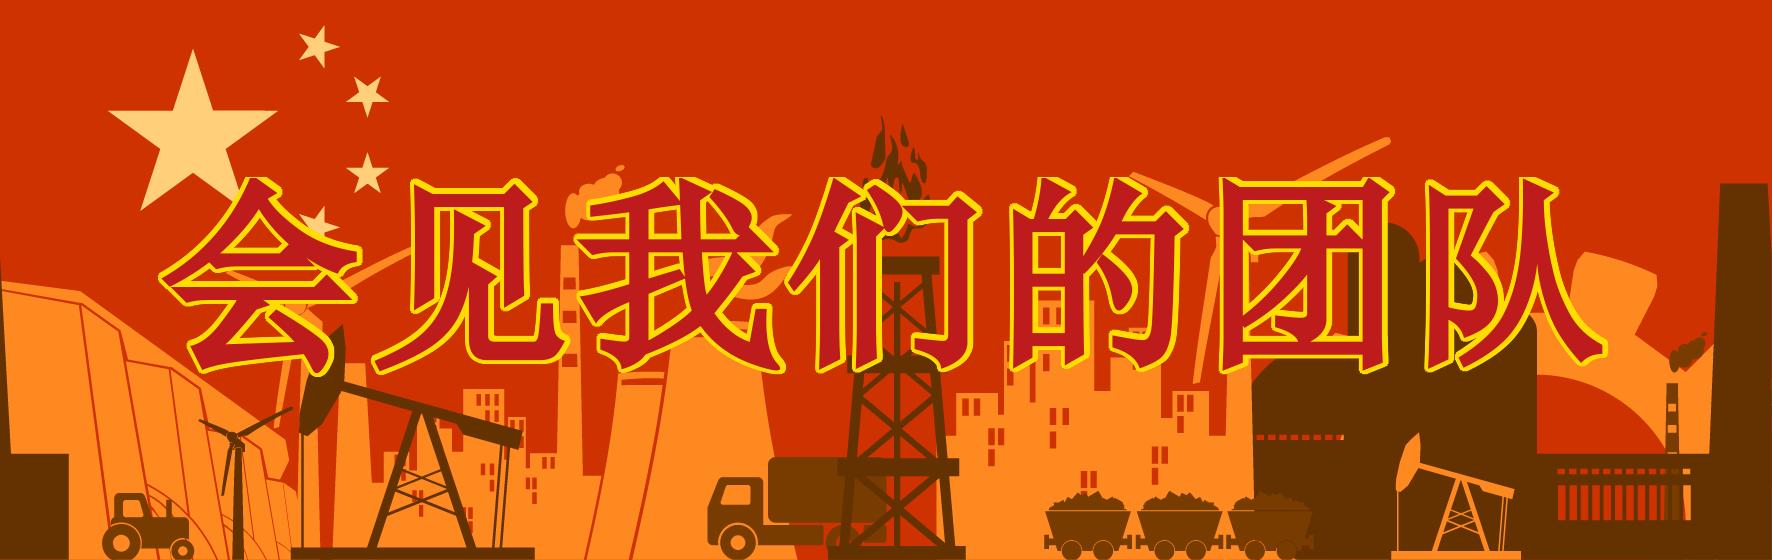 china sales team